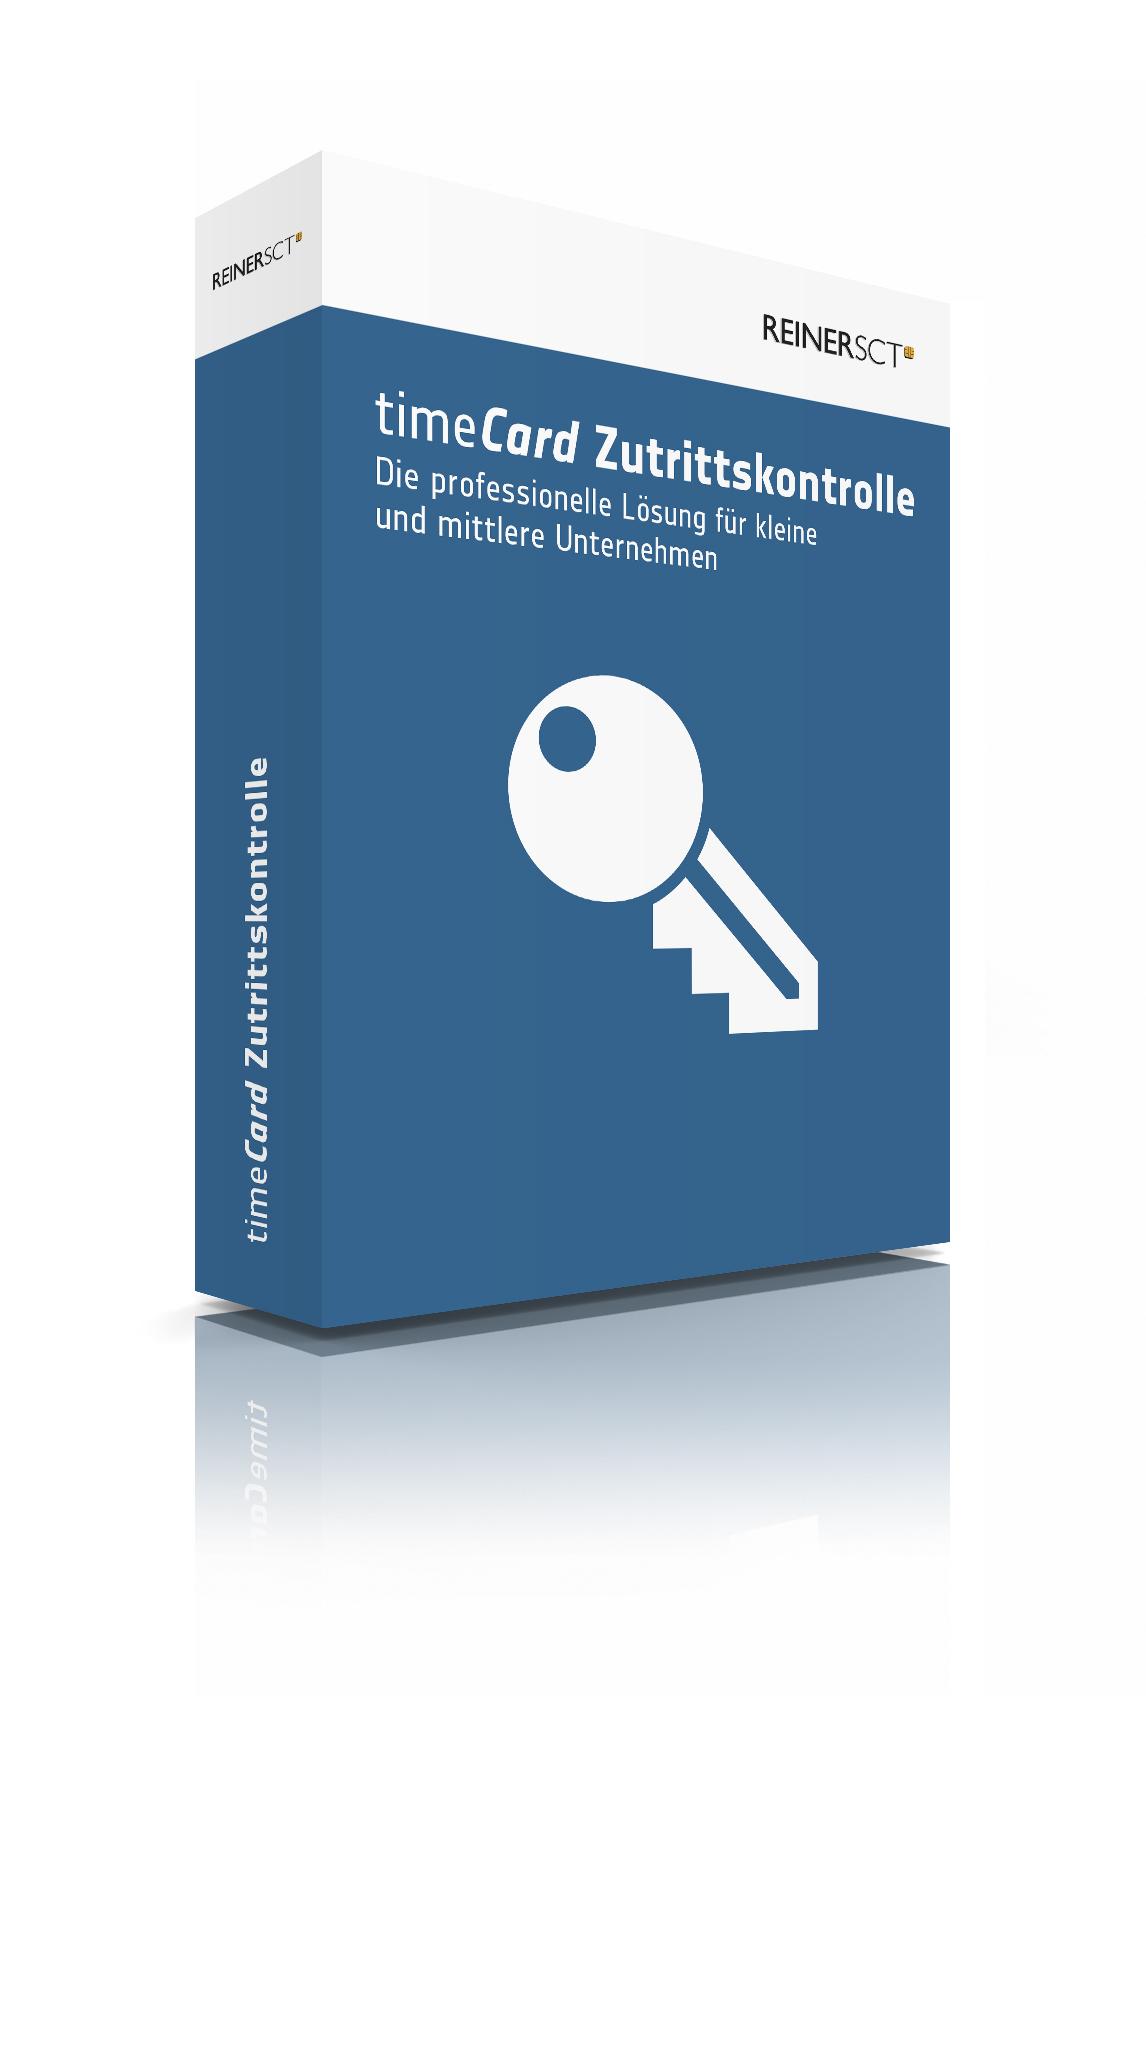 REINER_SCT_Zutrittskontrolle_Packshot